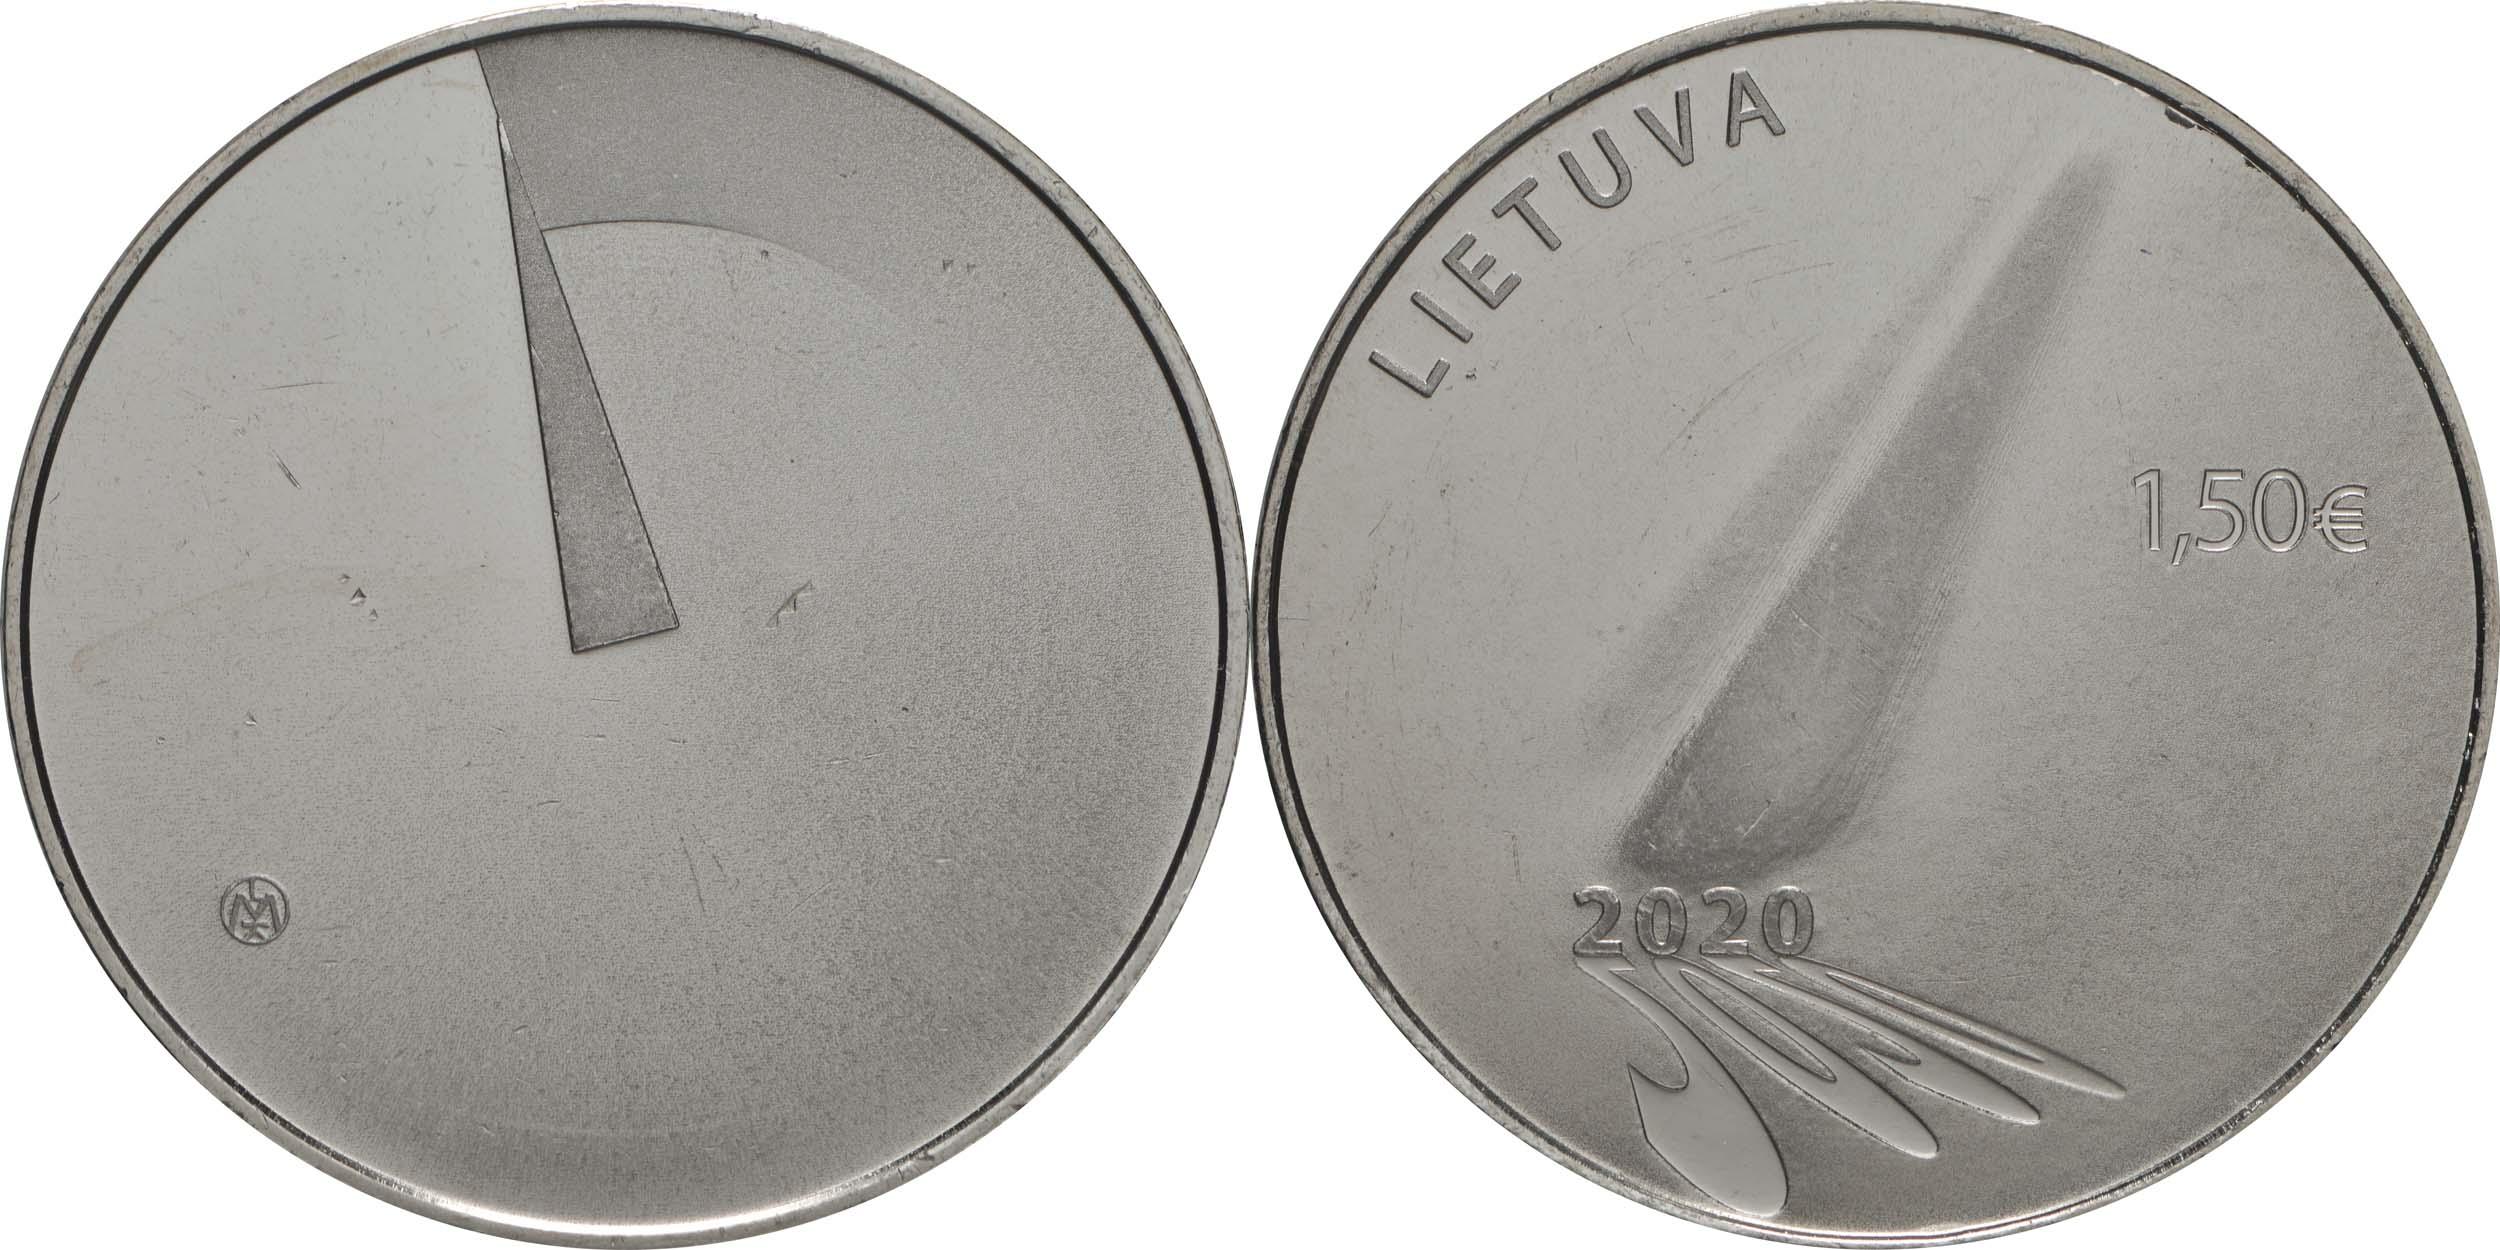 Lieferumfang:Litauen : 1,5 Euro Corona - Hoffnung  2020 Stgl.